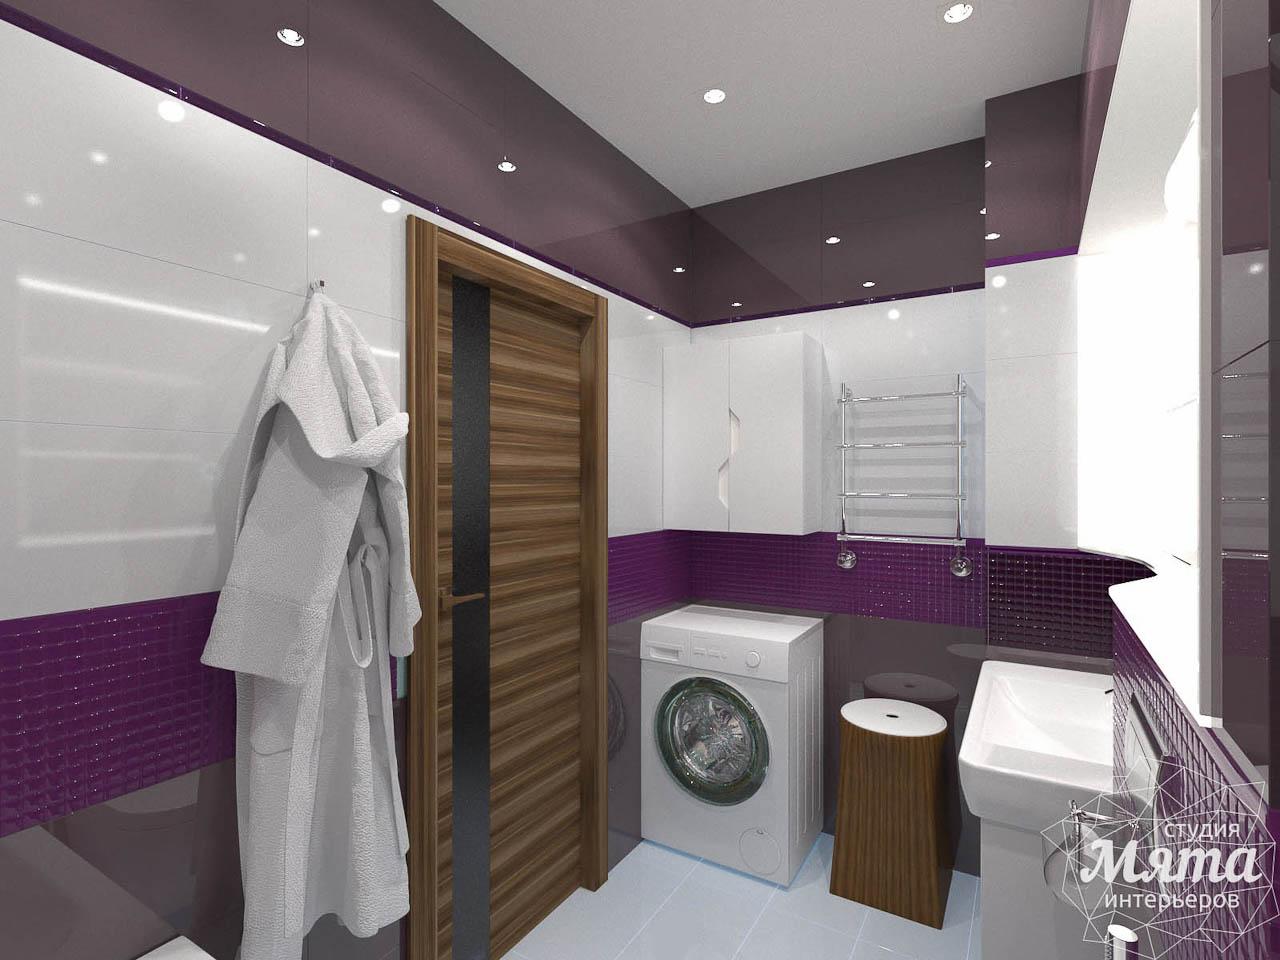 Дизайн интерьера трехкомнатной квартиры по ул. Мельникова 27 img1646354004